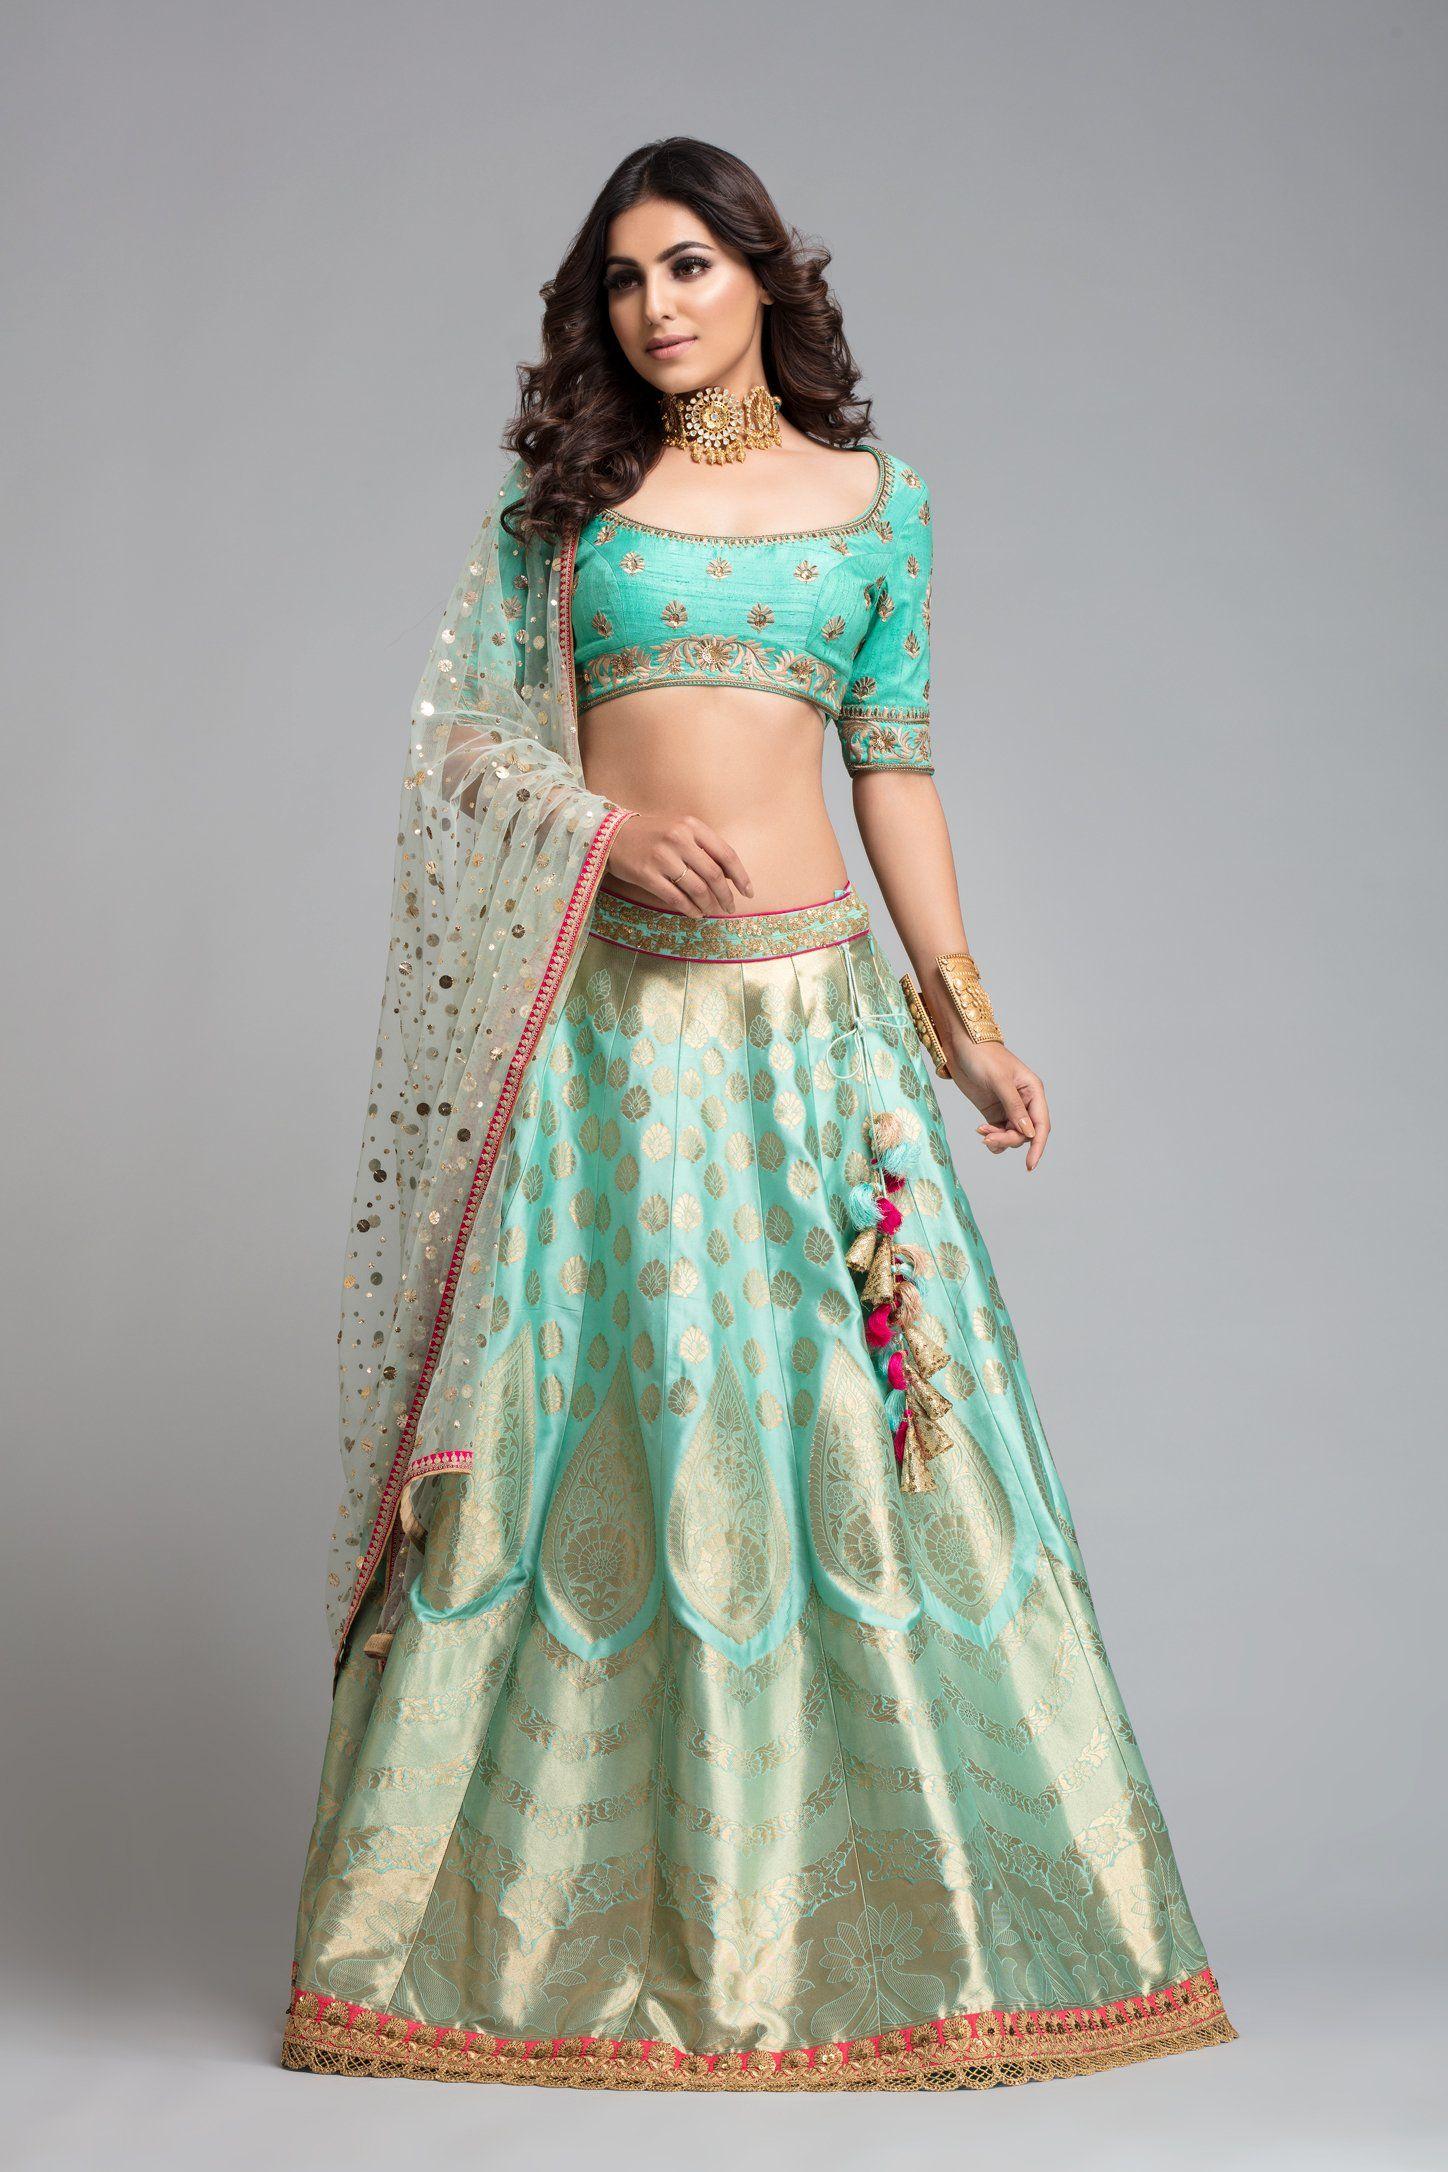 895c15fda4 Hand embroidered blouse with banarsi lehenga clubbed with mint mukaish  dupatta. Fabric: Raw Silk / Jacquard